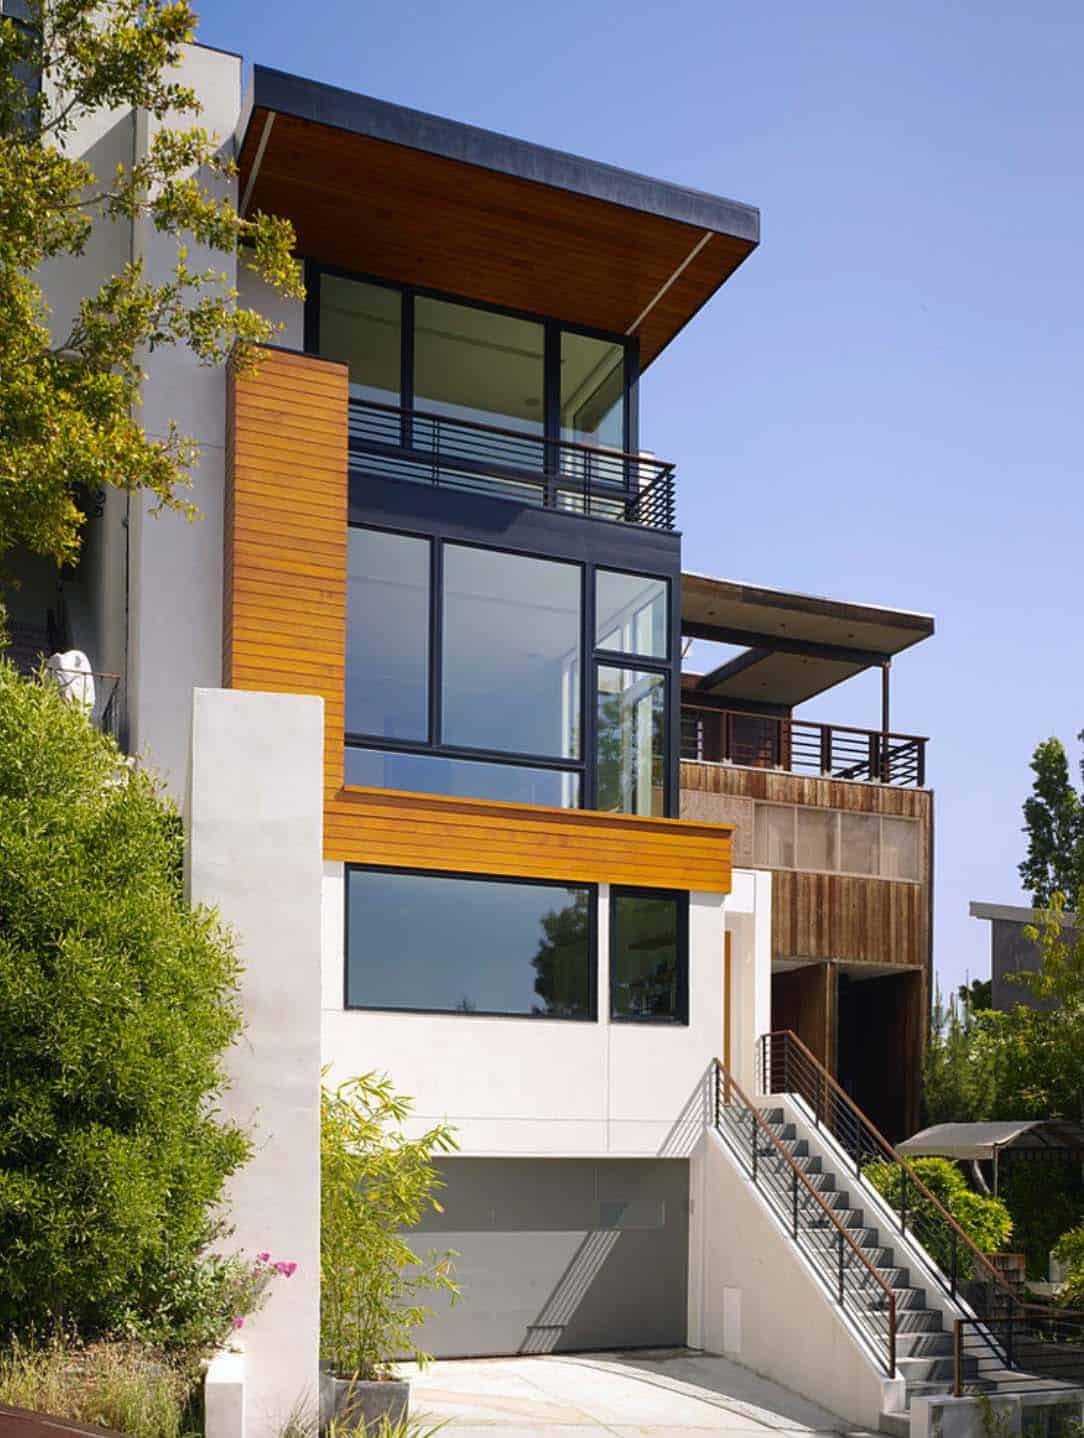 Architecture Modern Hillside Home-26-1 Kindesign